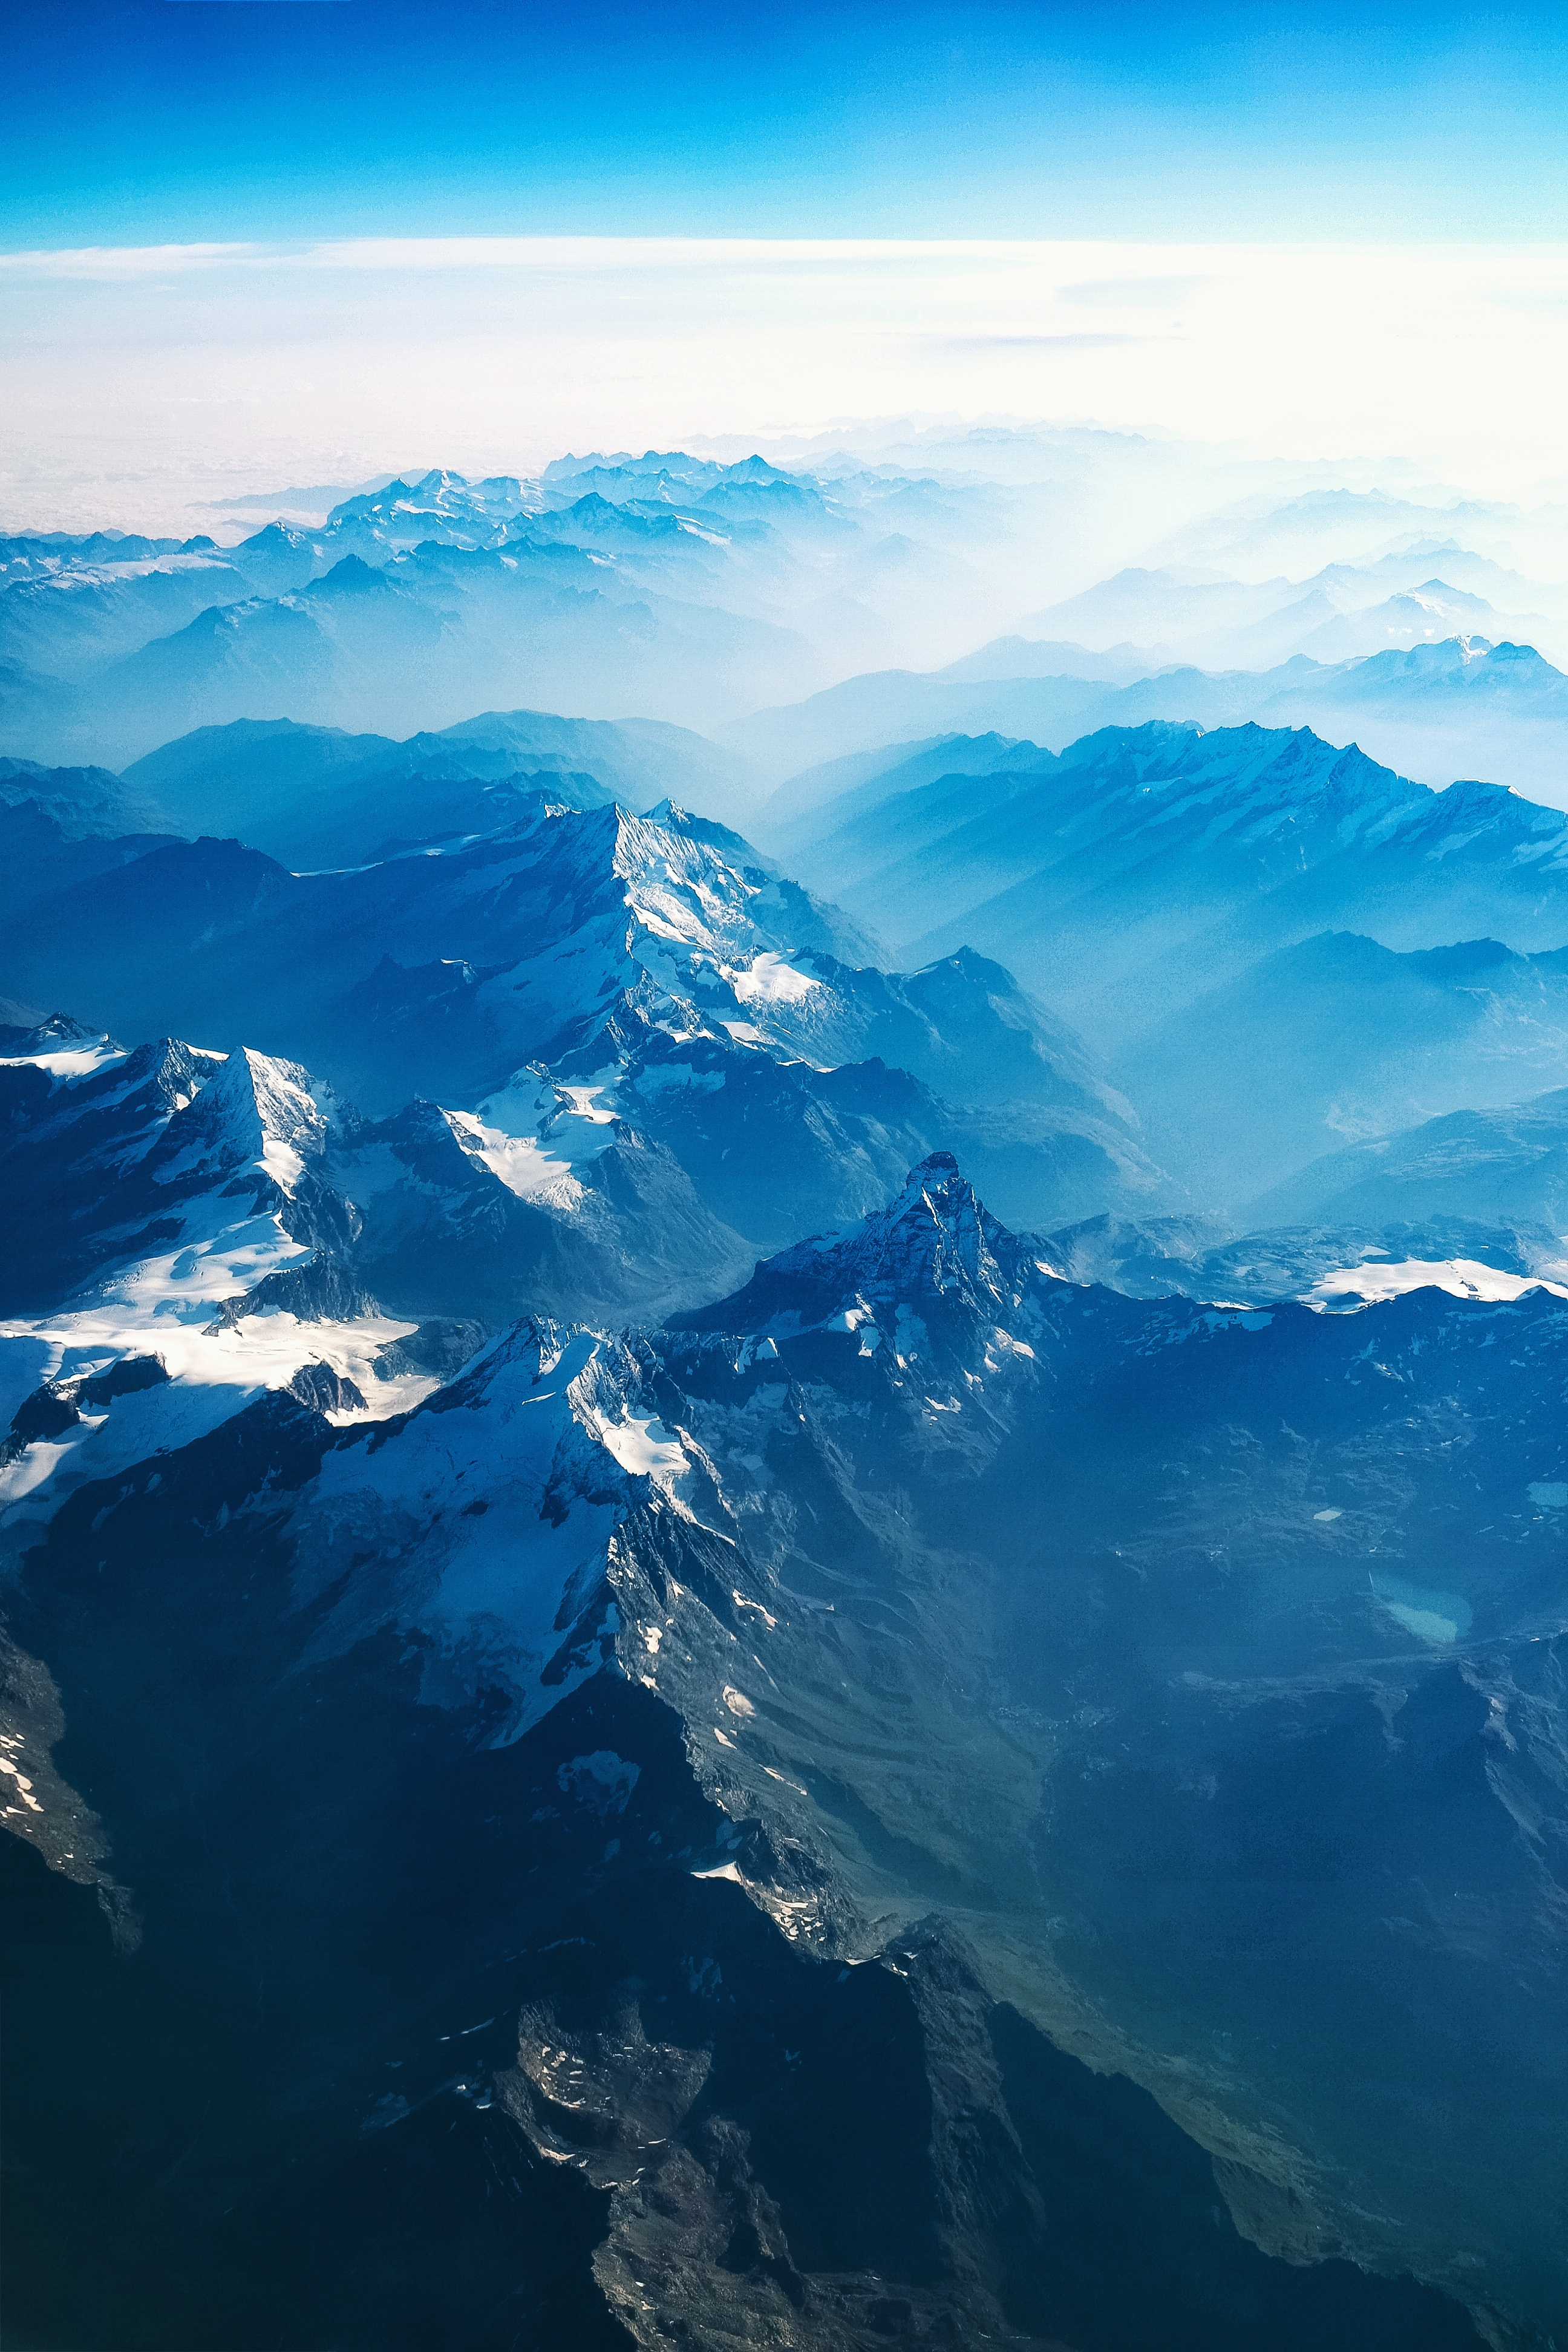 Birds Eye View Of Mountains